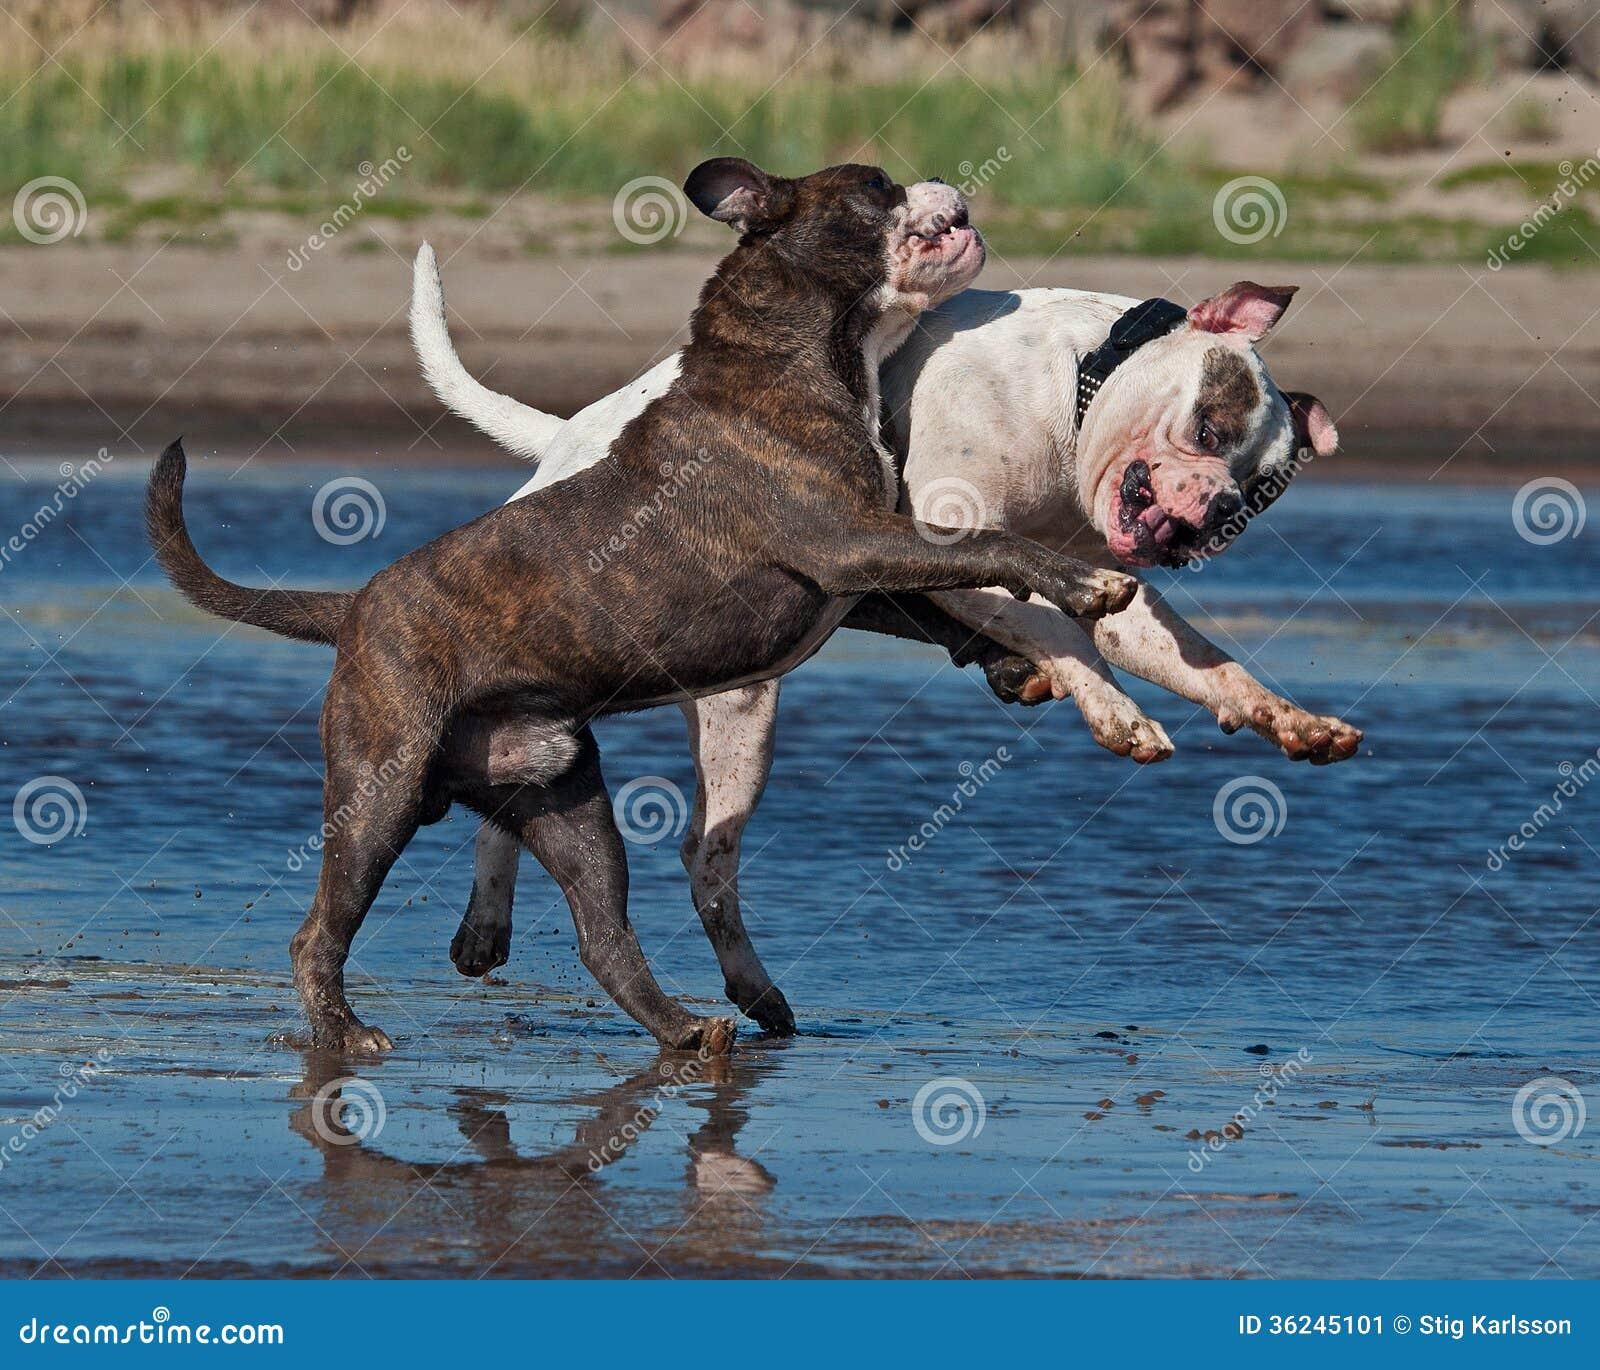 Pitbull red american bulldog blue american bulldog puppies for sale